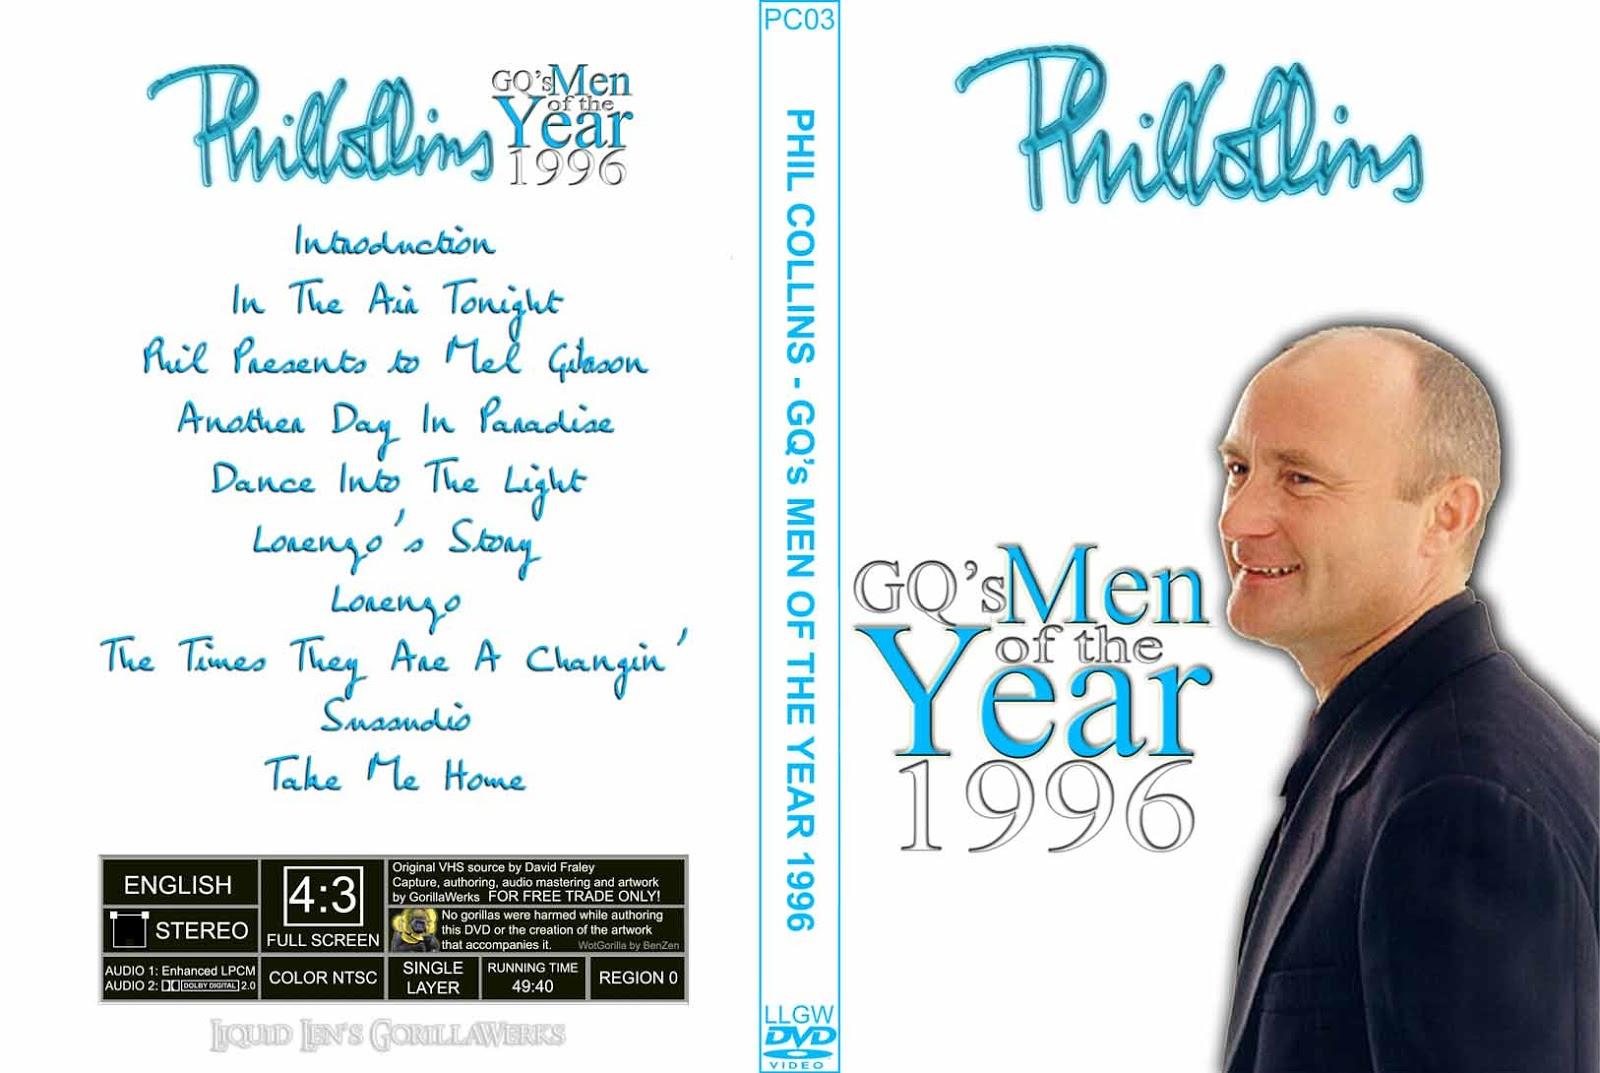 http://1.bp.blogspot.com/-Cd7zV0-U8nA/T7bfrucjwNI/AAAAAAAAF-8/kG30Yw9JeZ8/s1600/DVD+Cover+-+Phil+Collins+-+GQ\'s+Men+Of+The+Year+1996.jpg